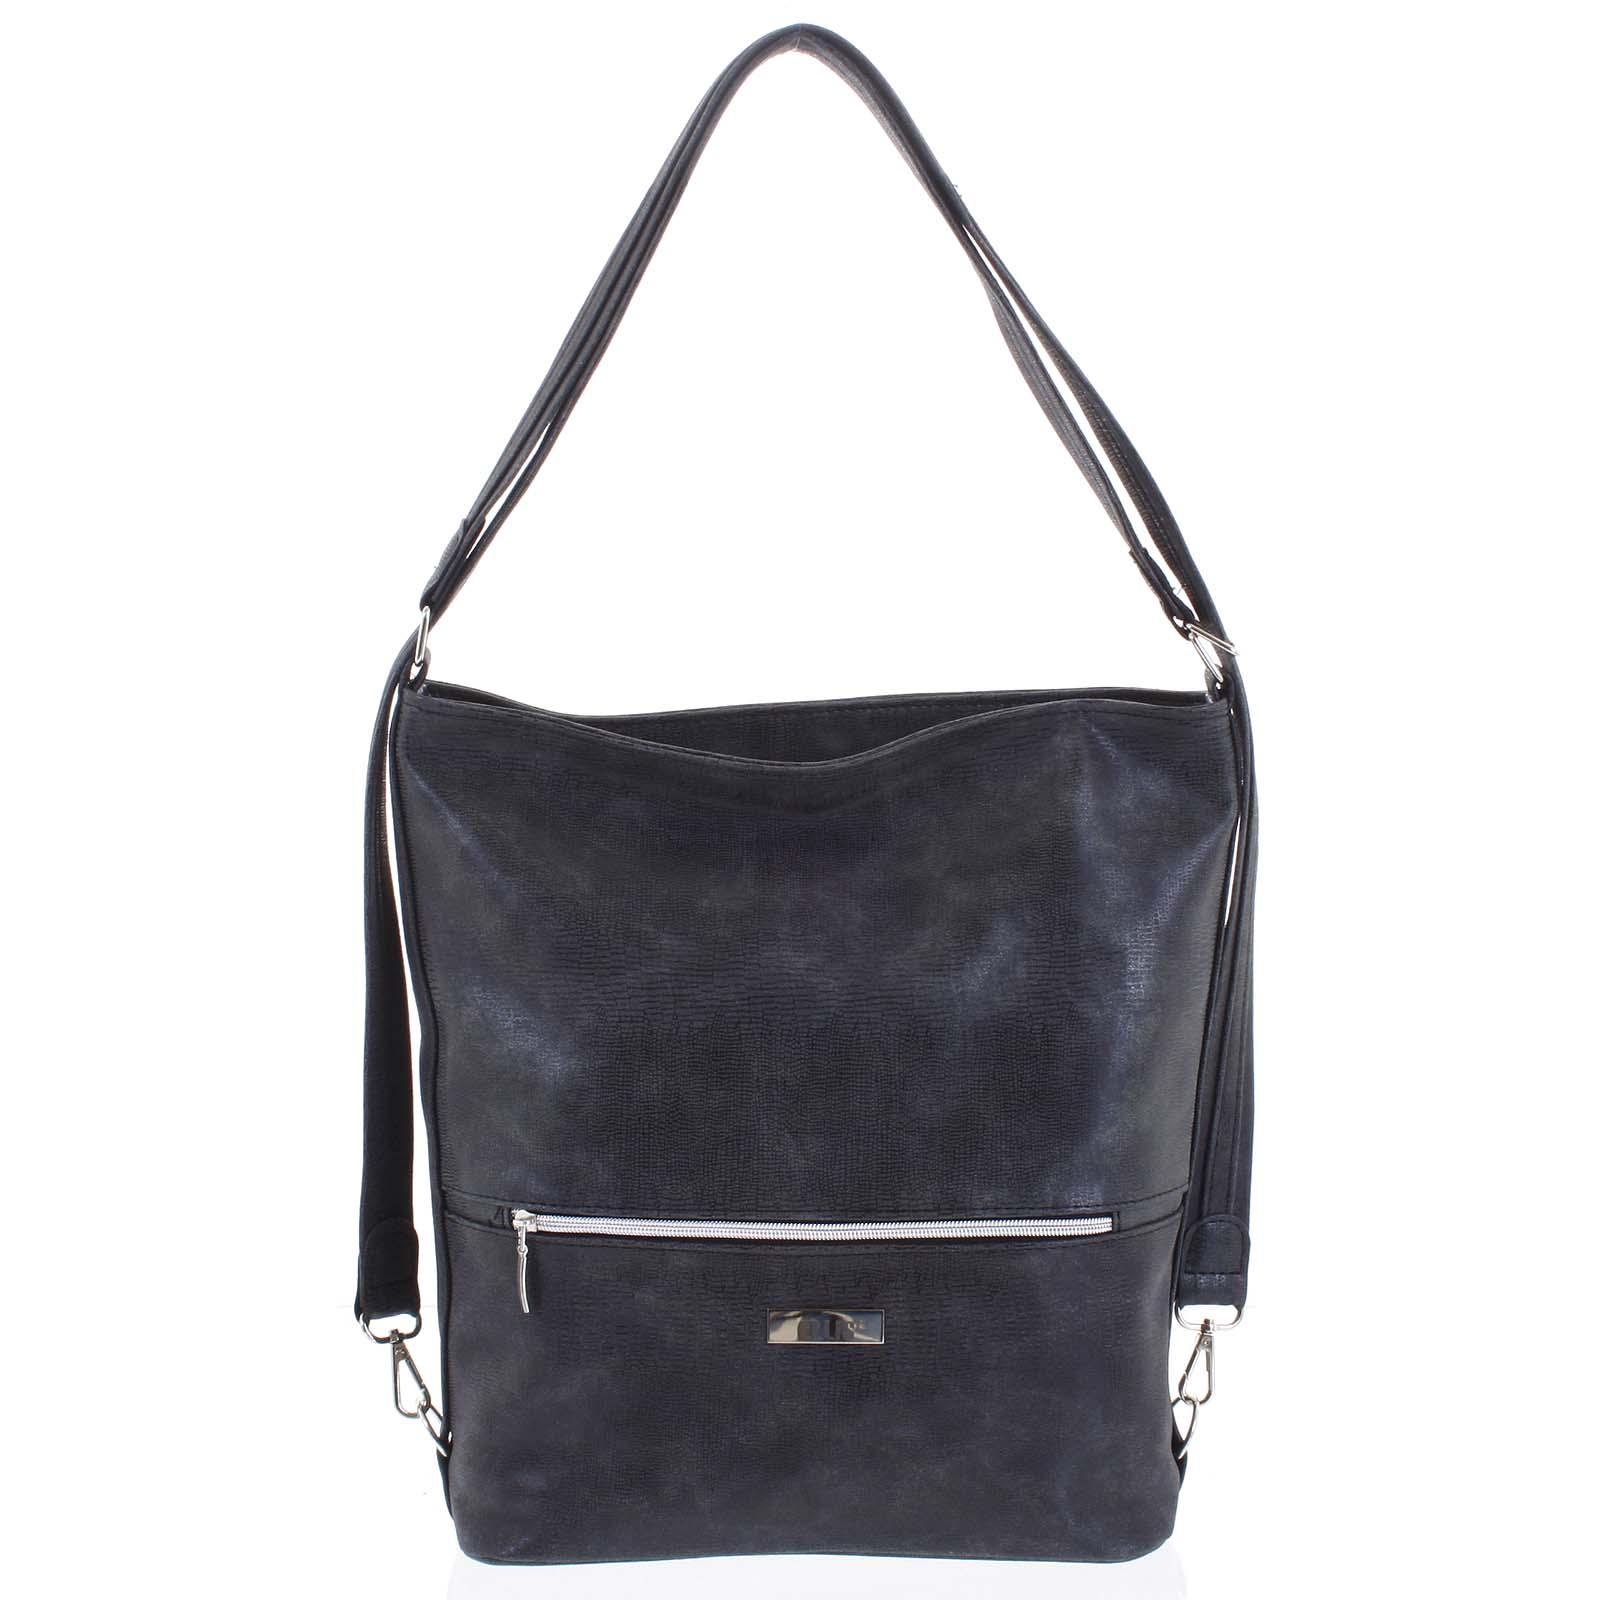 Módní dámská kabelka batoh tmavě šedá se vzorem - Ellis Patrik